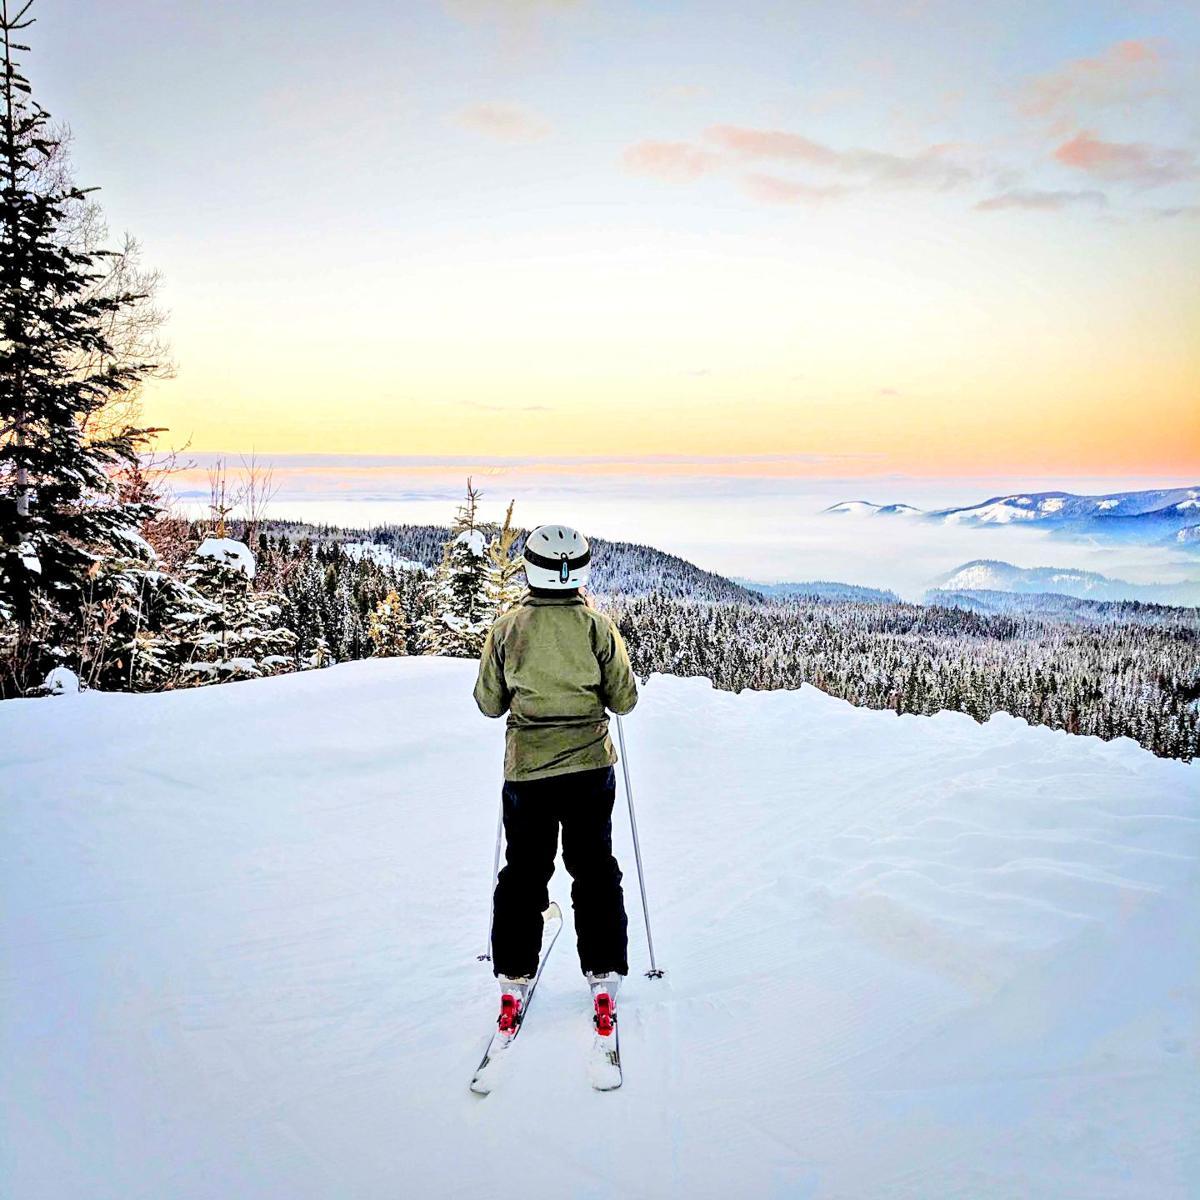 Grace Hunt surveyed the mountain